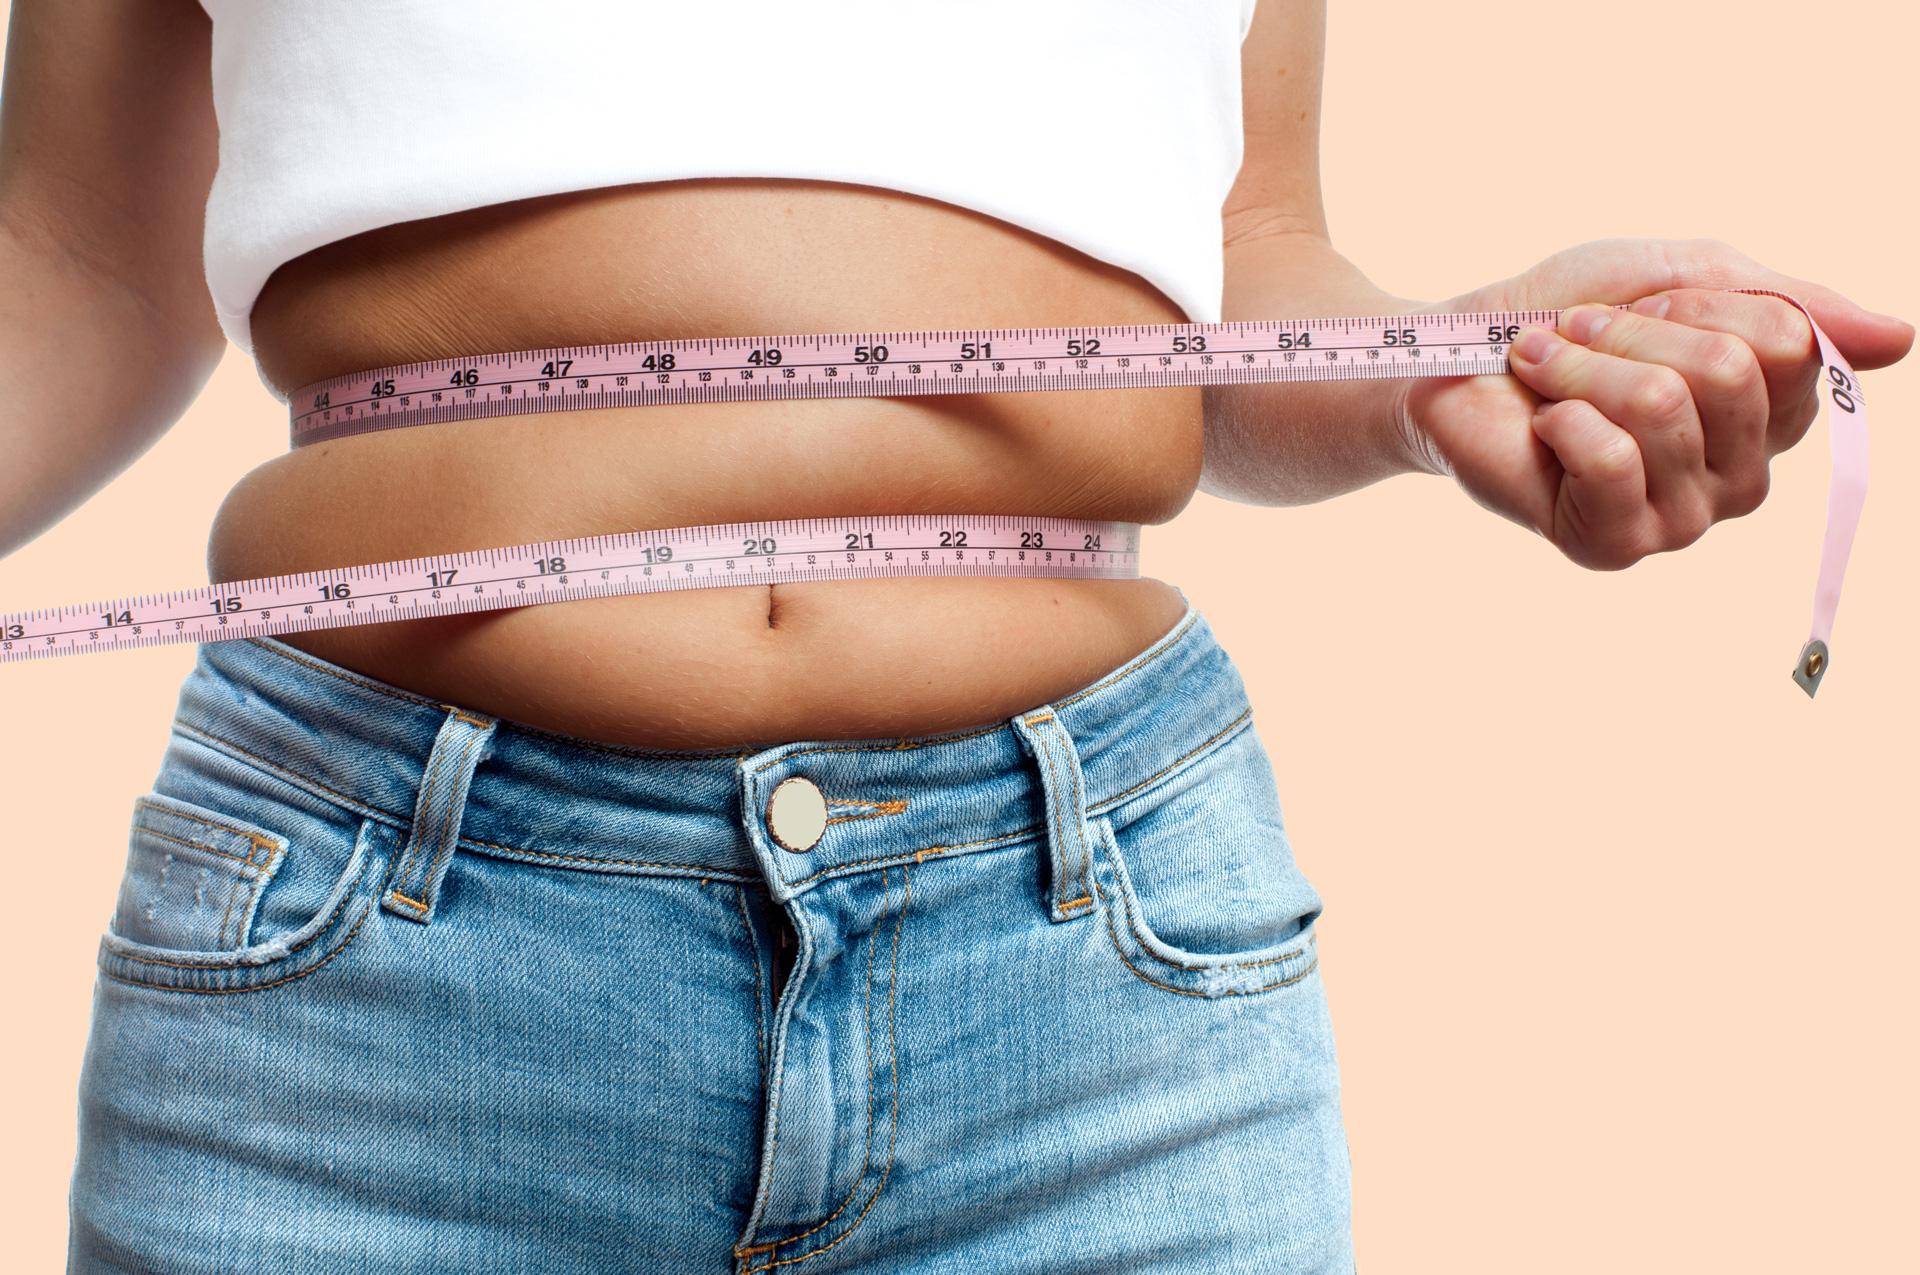 Welche Diät passt zu mir? Frau mit Maßband am Bauch